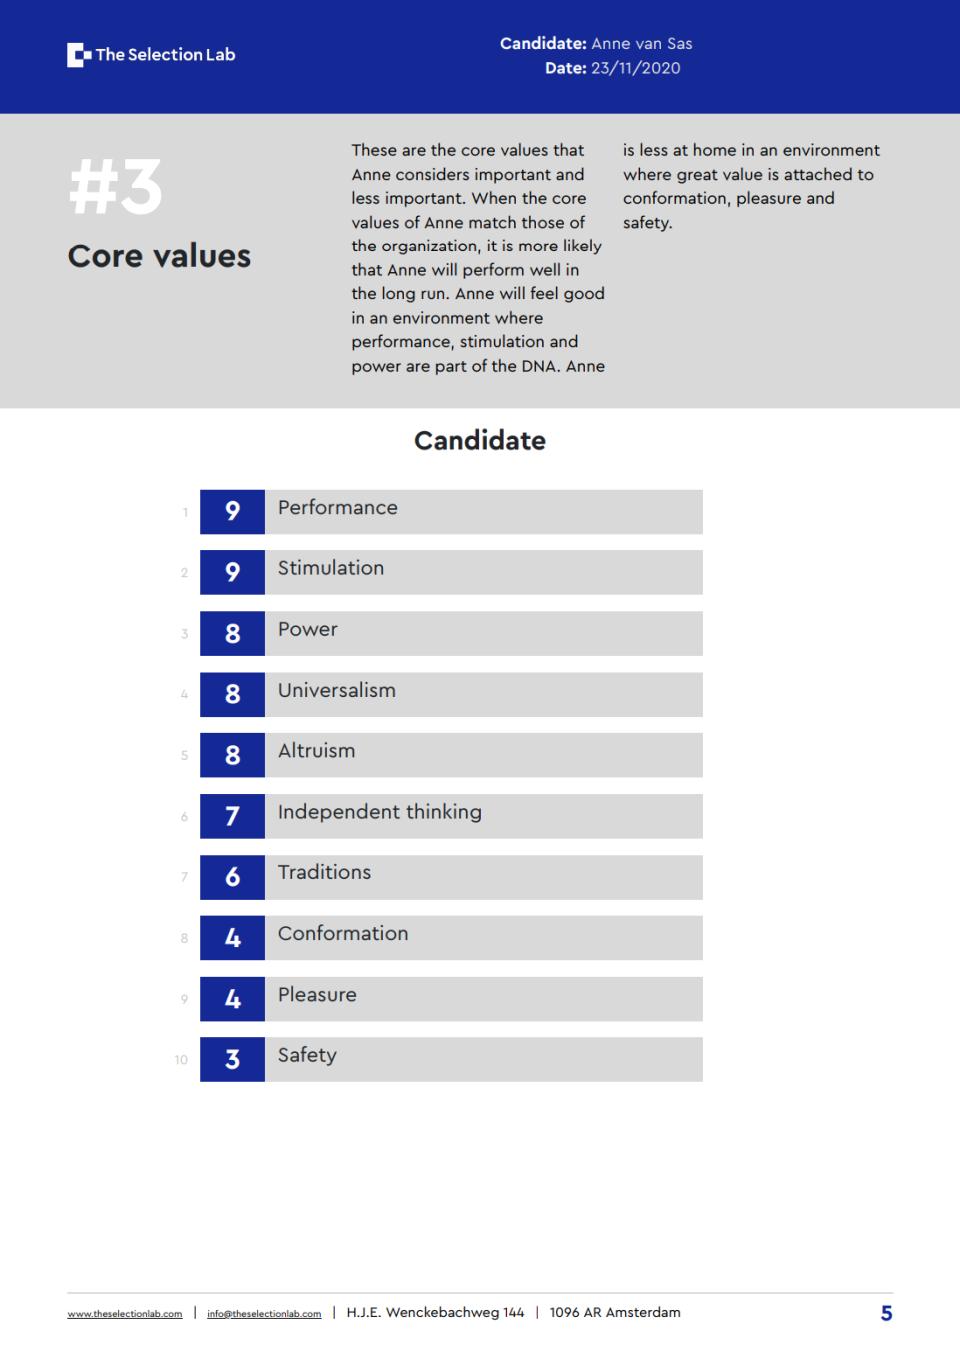 Core values section